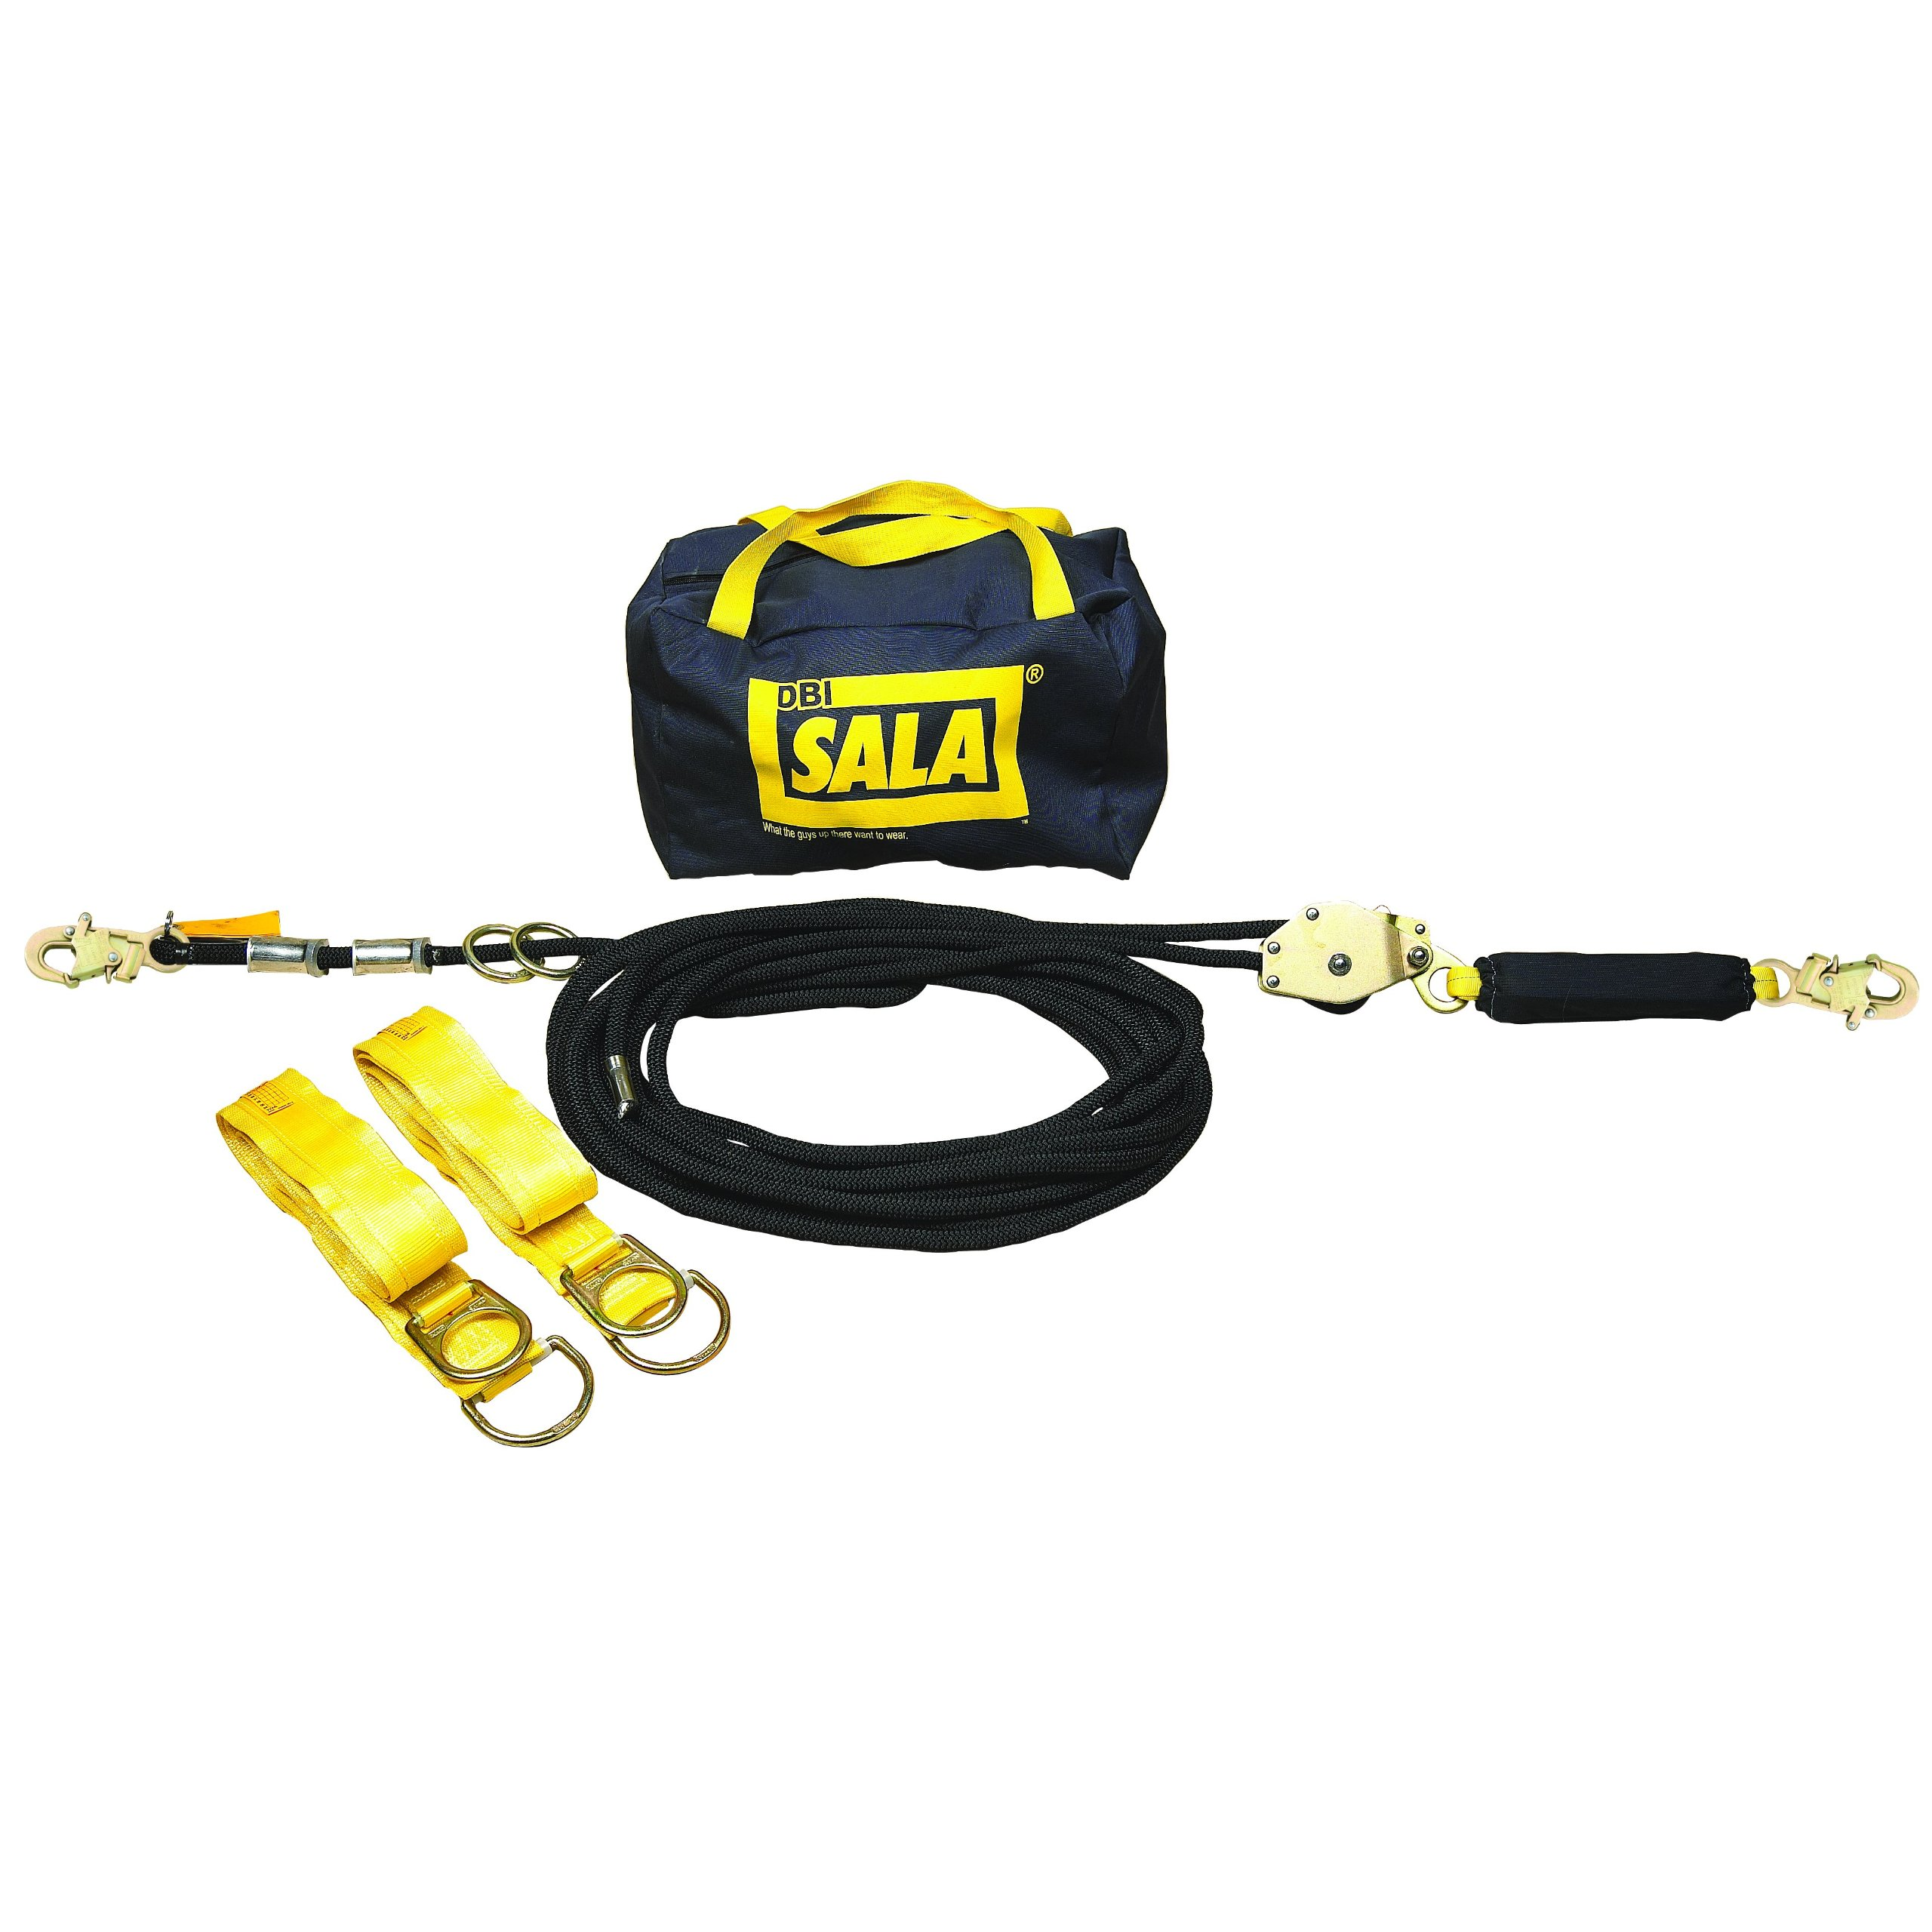 3M DBI-SALA 7600503 Horizontal Lifeline System, 30' Kernmantle Rope with Tensioner, Energy Absorber, Two 6' Tie-Off Adaptors, Carrying Bag, Black